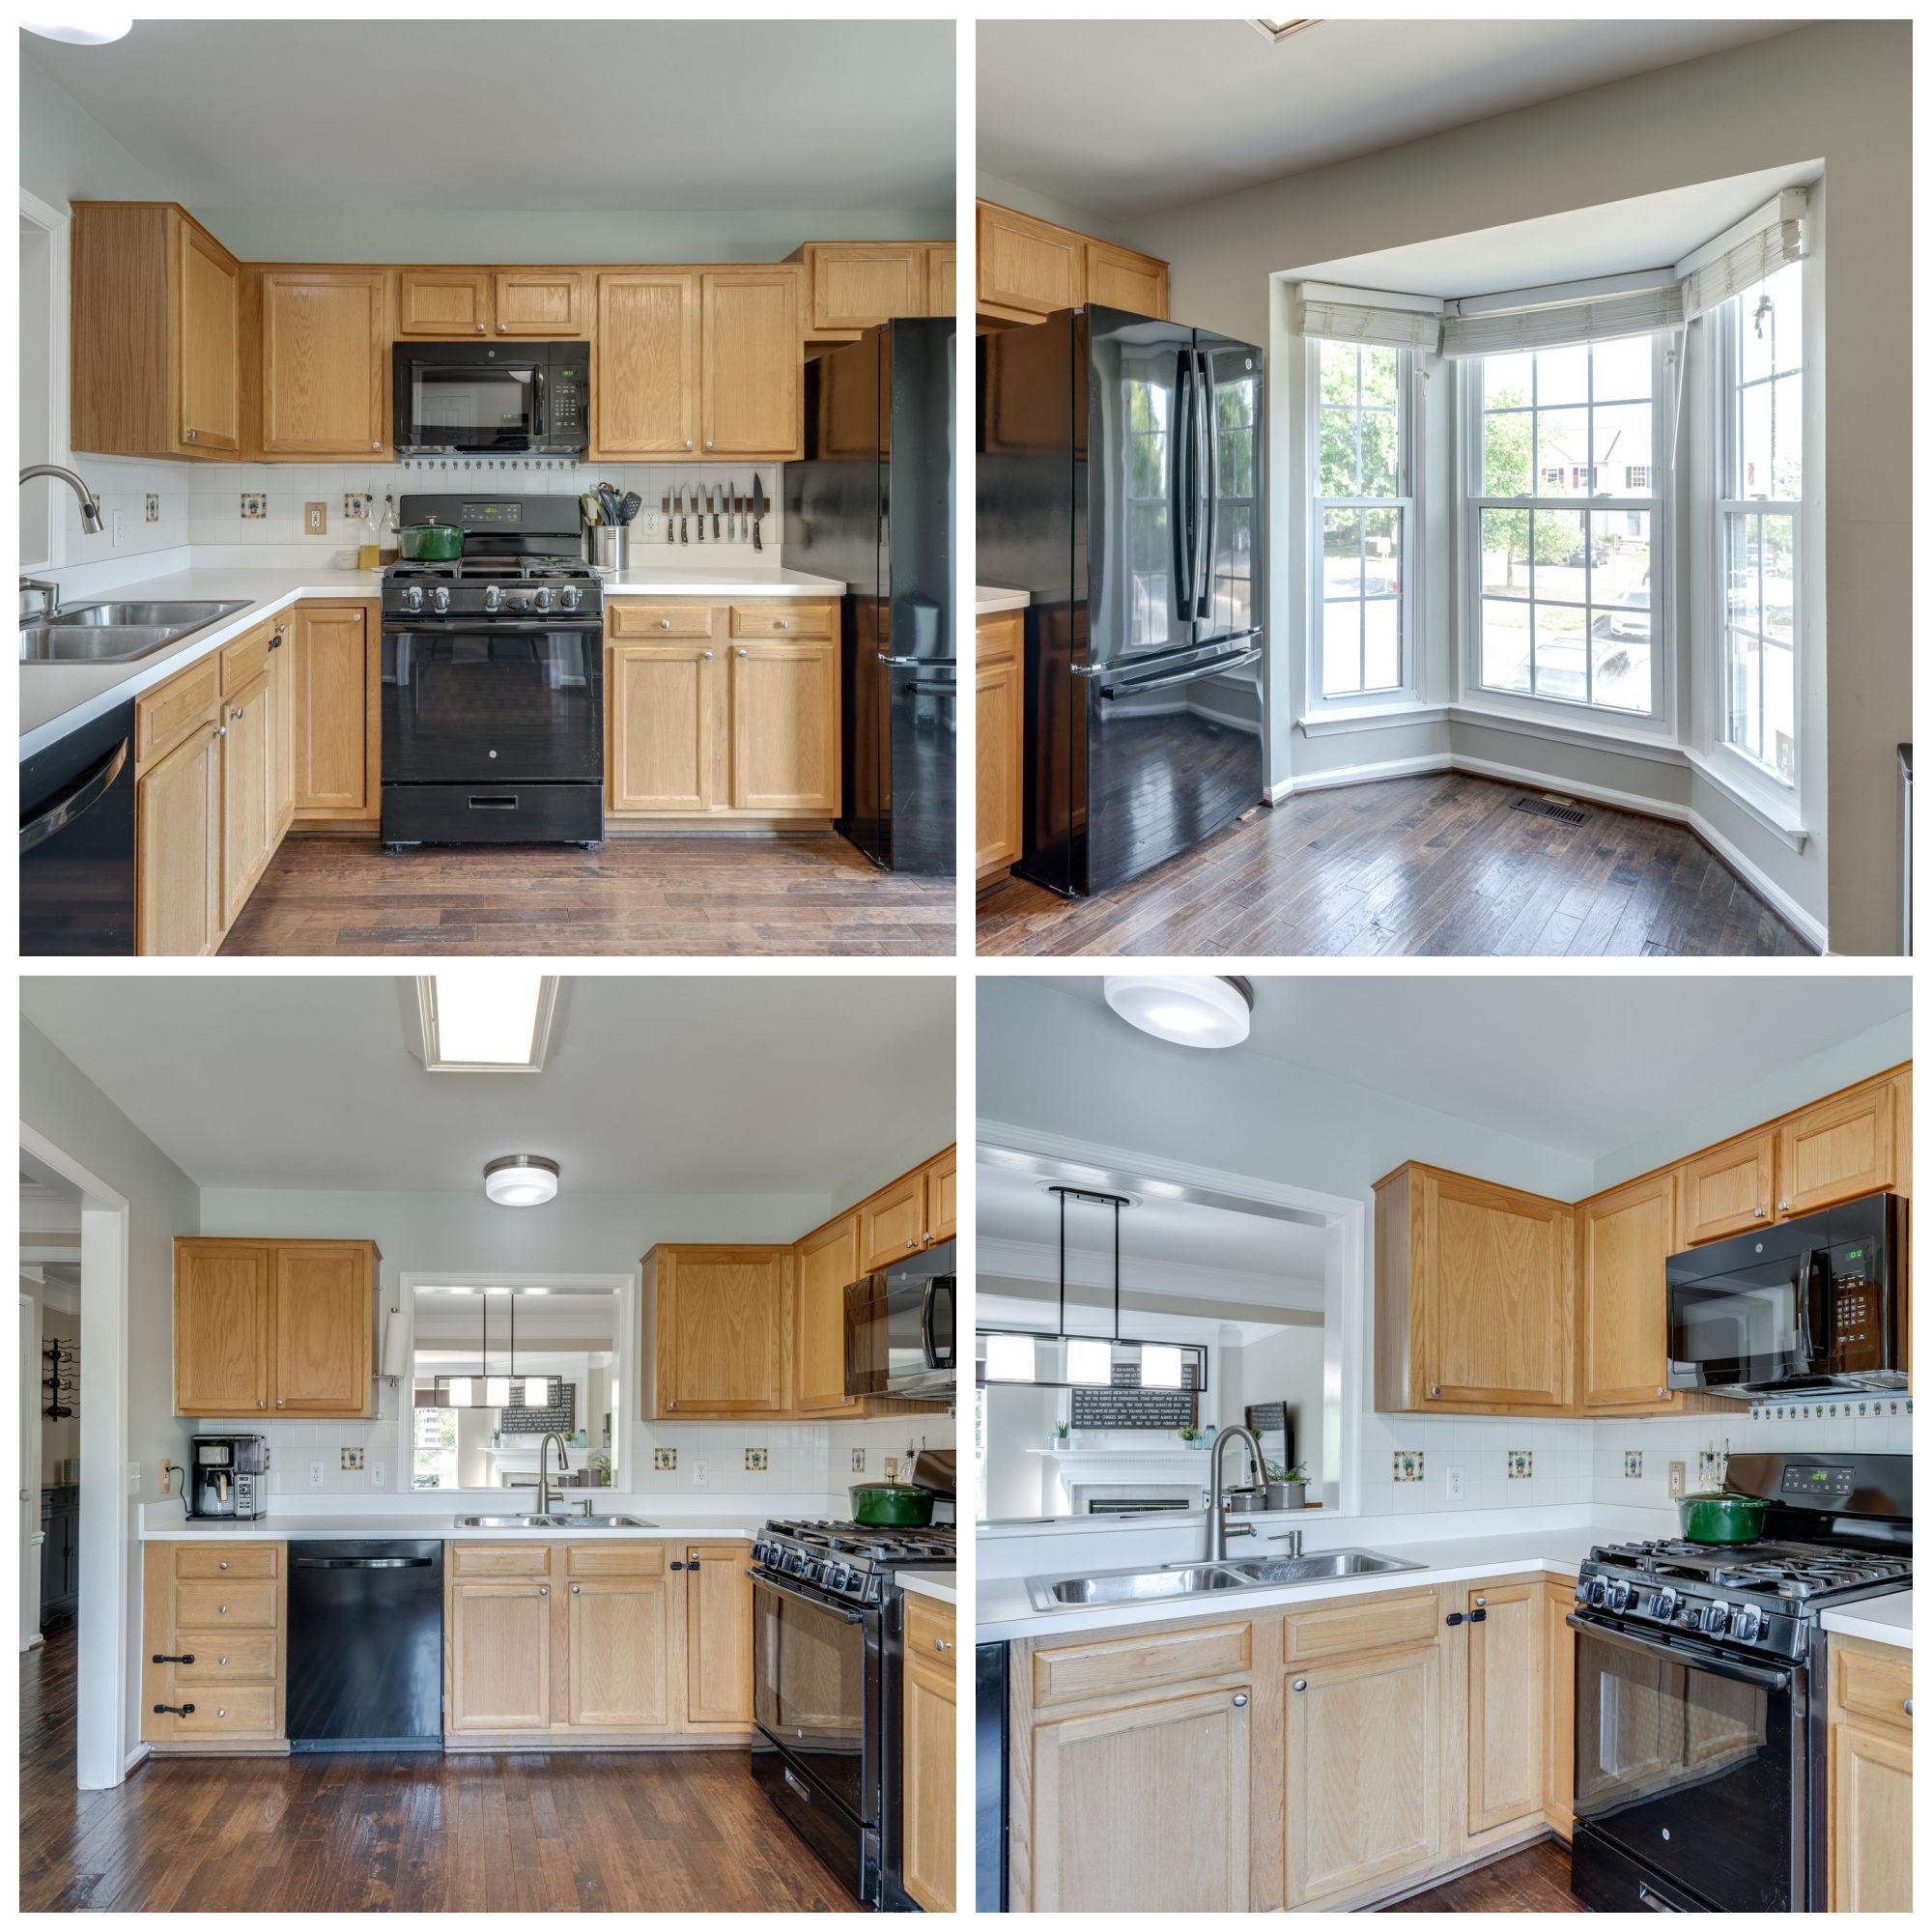 334 Millbrook Ter NE, Leesburg- Kitchen